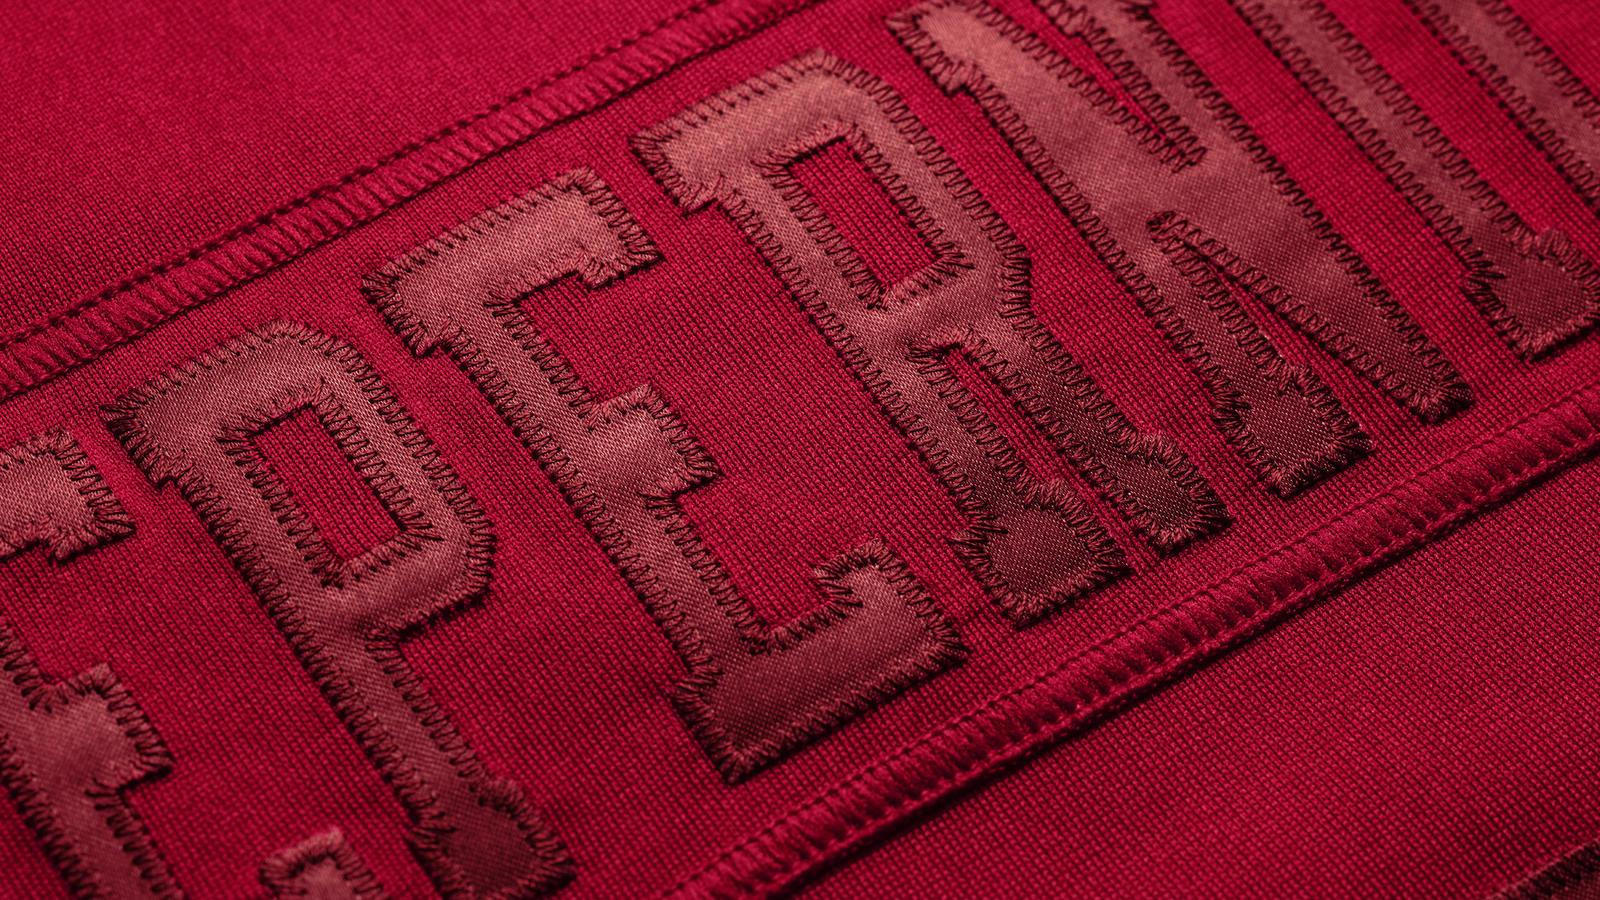 fa13_at_drenchpack_49ers_details_007_lr